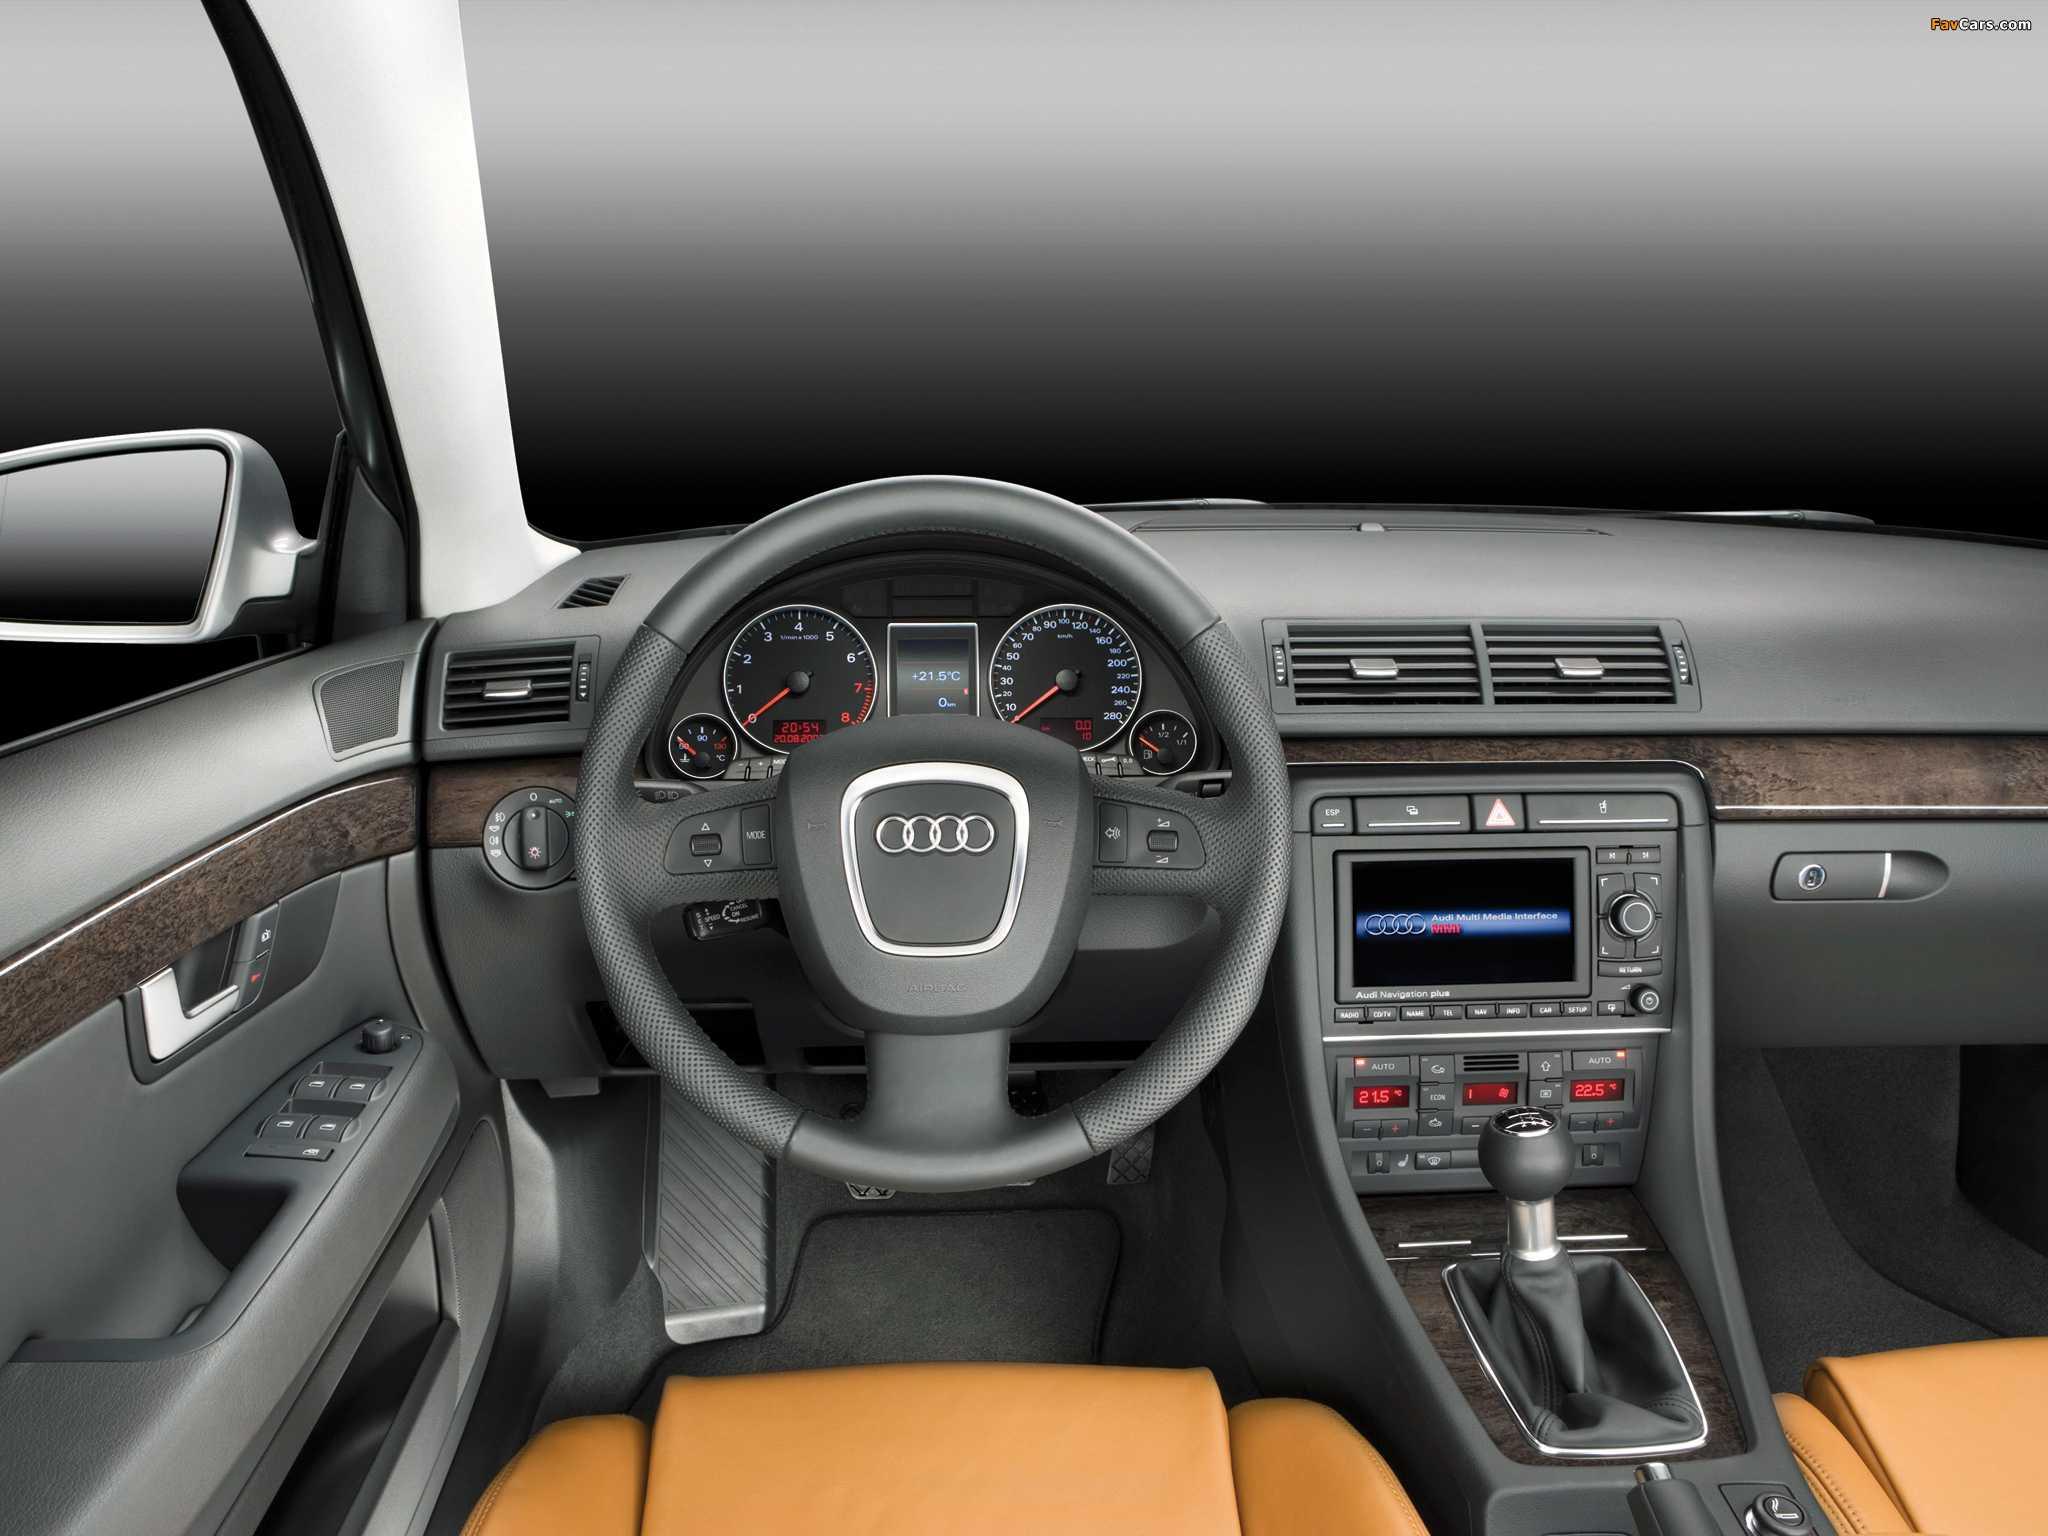 Проблемы с электроникой Audi А4 В7